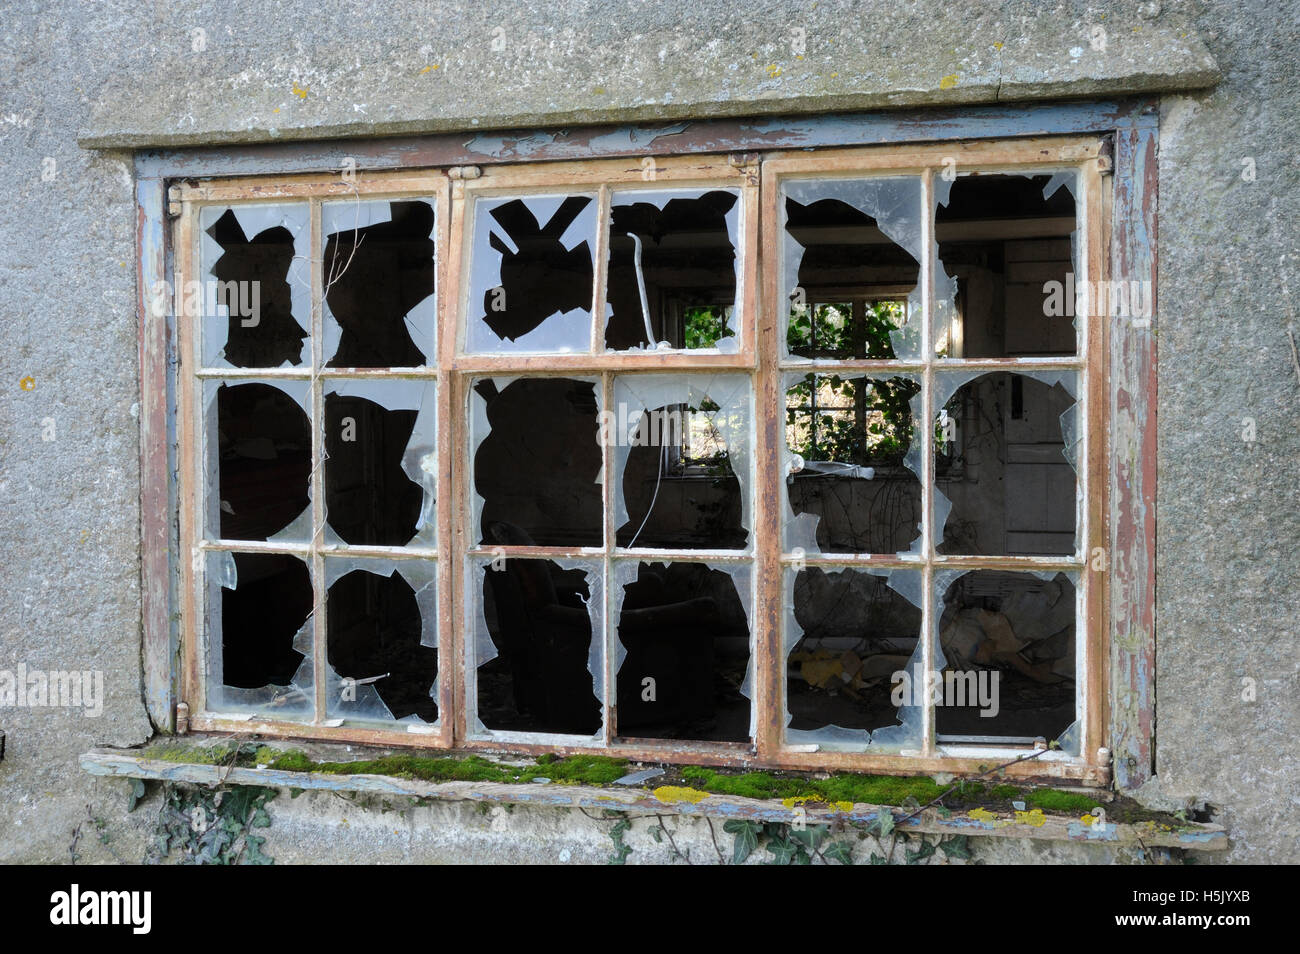 Abandoned cottage, broken windows, disrepair - Stock Image